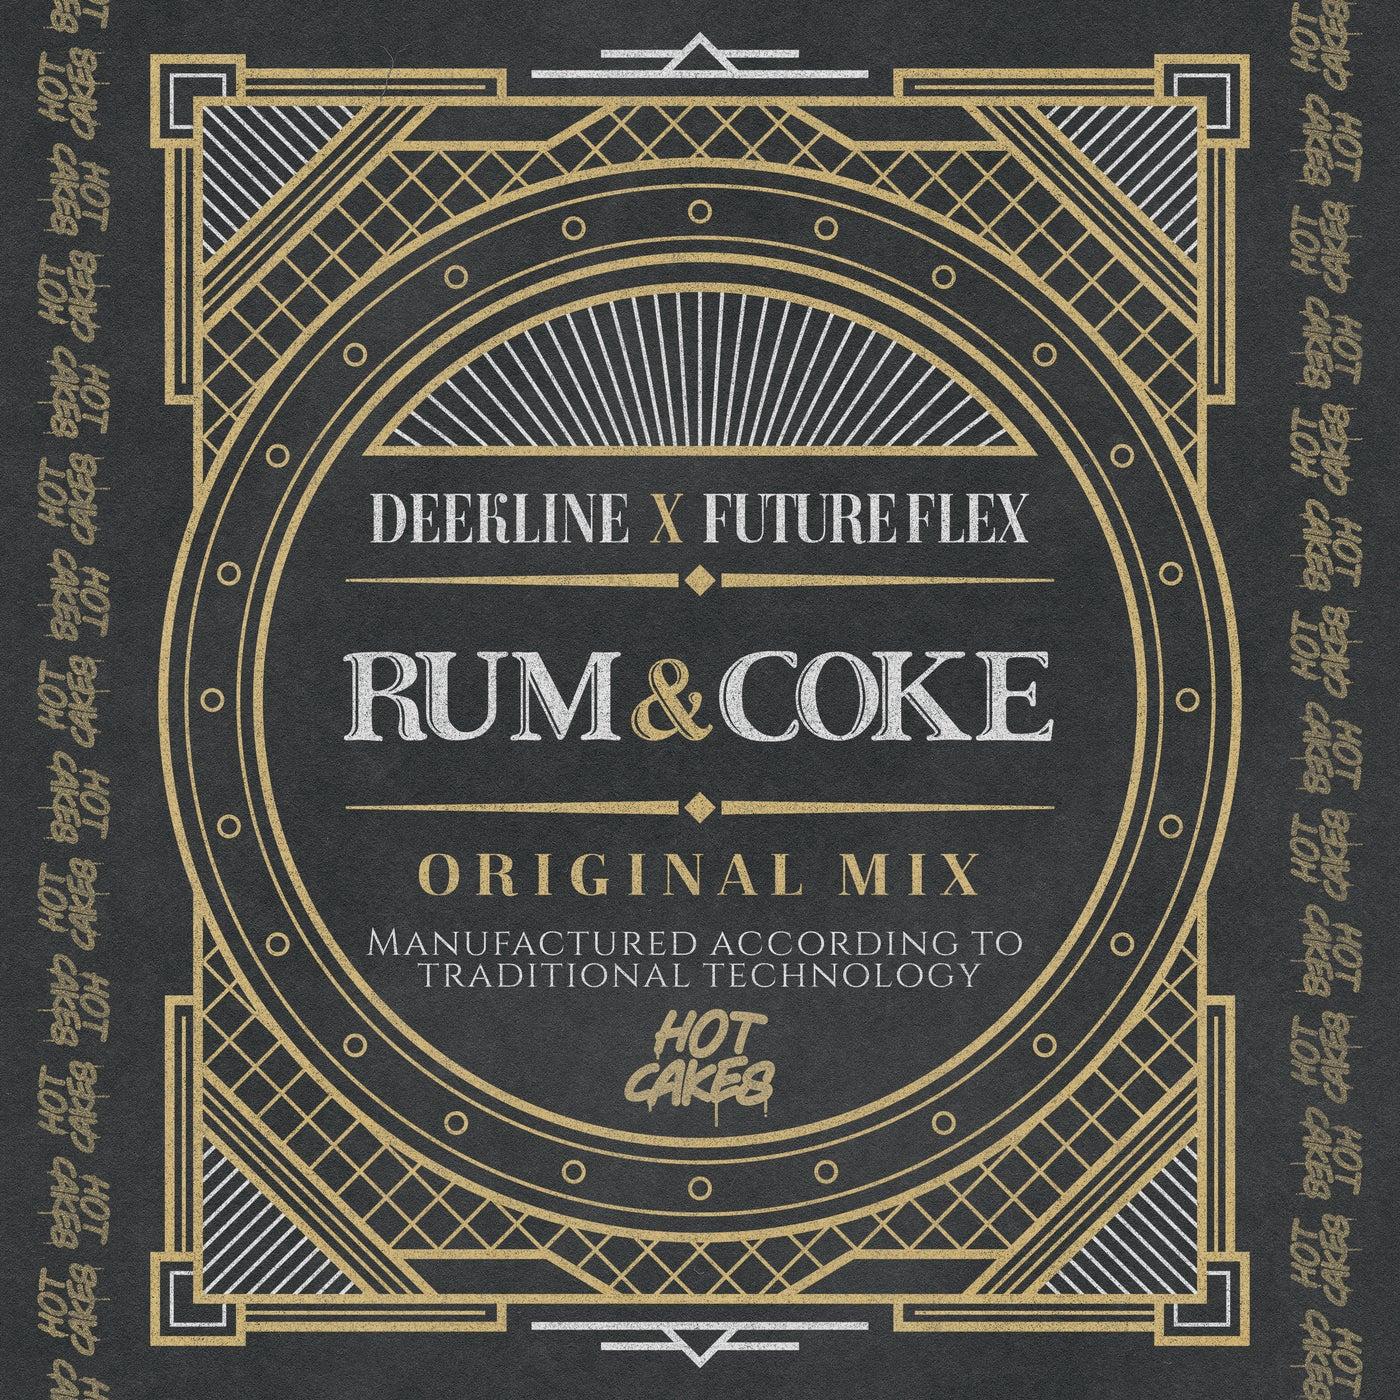 Rum & Coke (Original Mix)